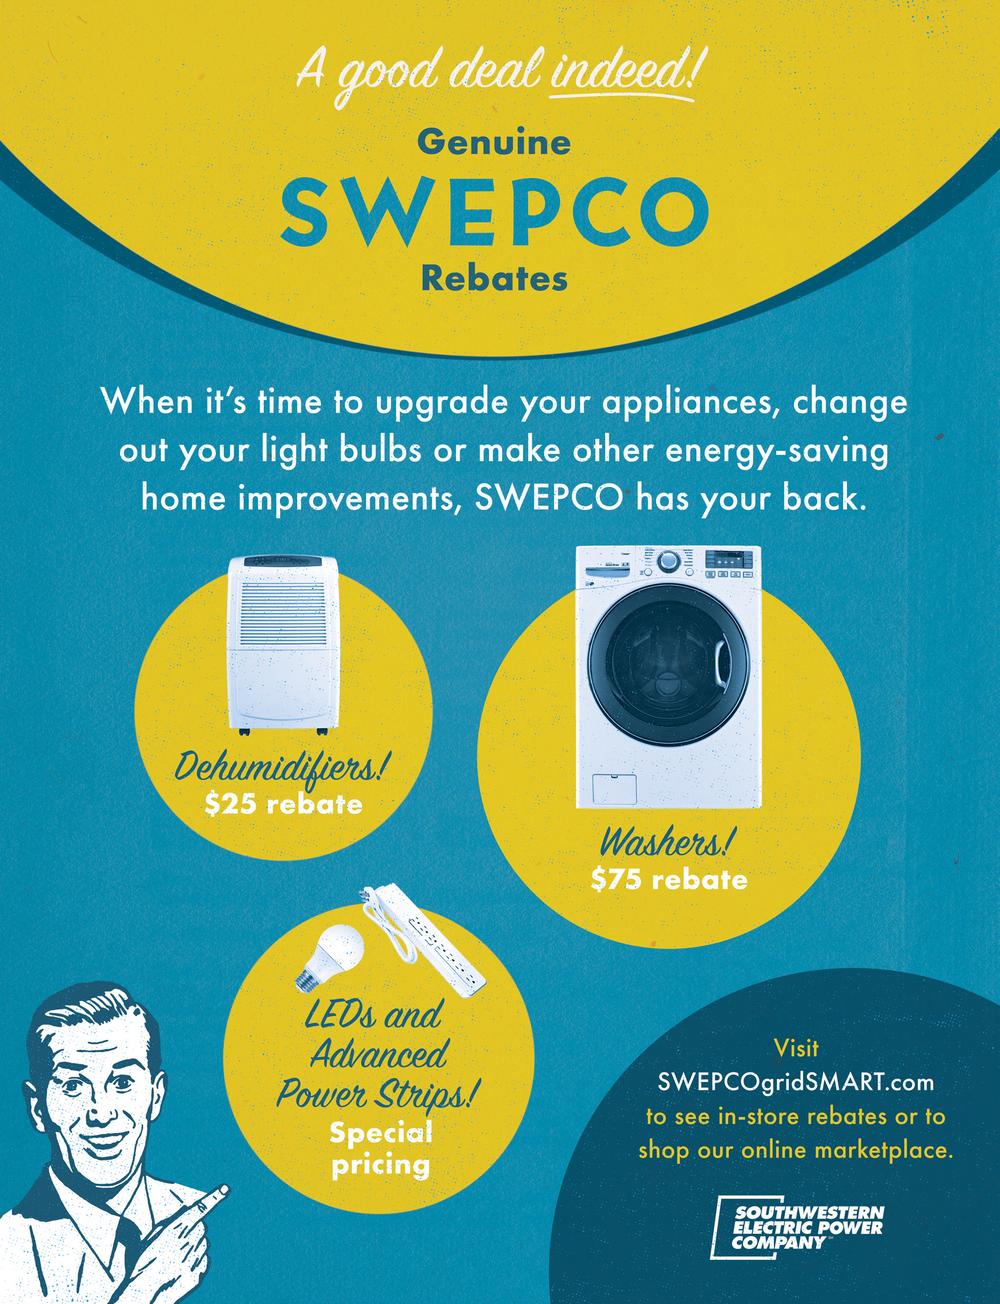 Genuine SWEPCO Rebates